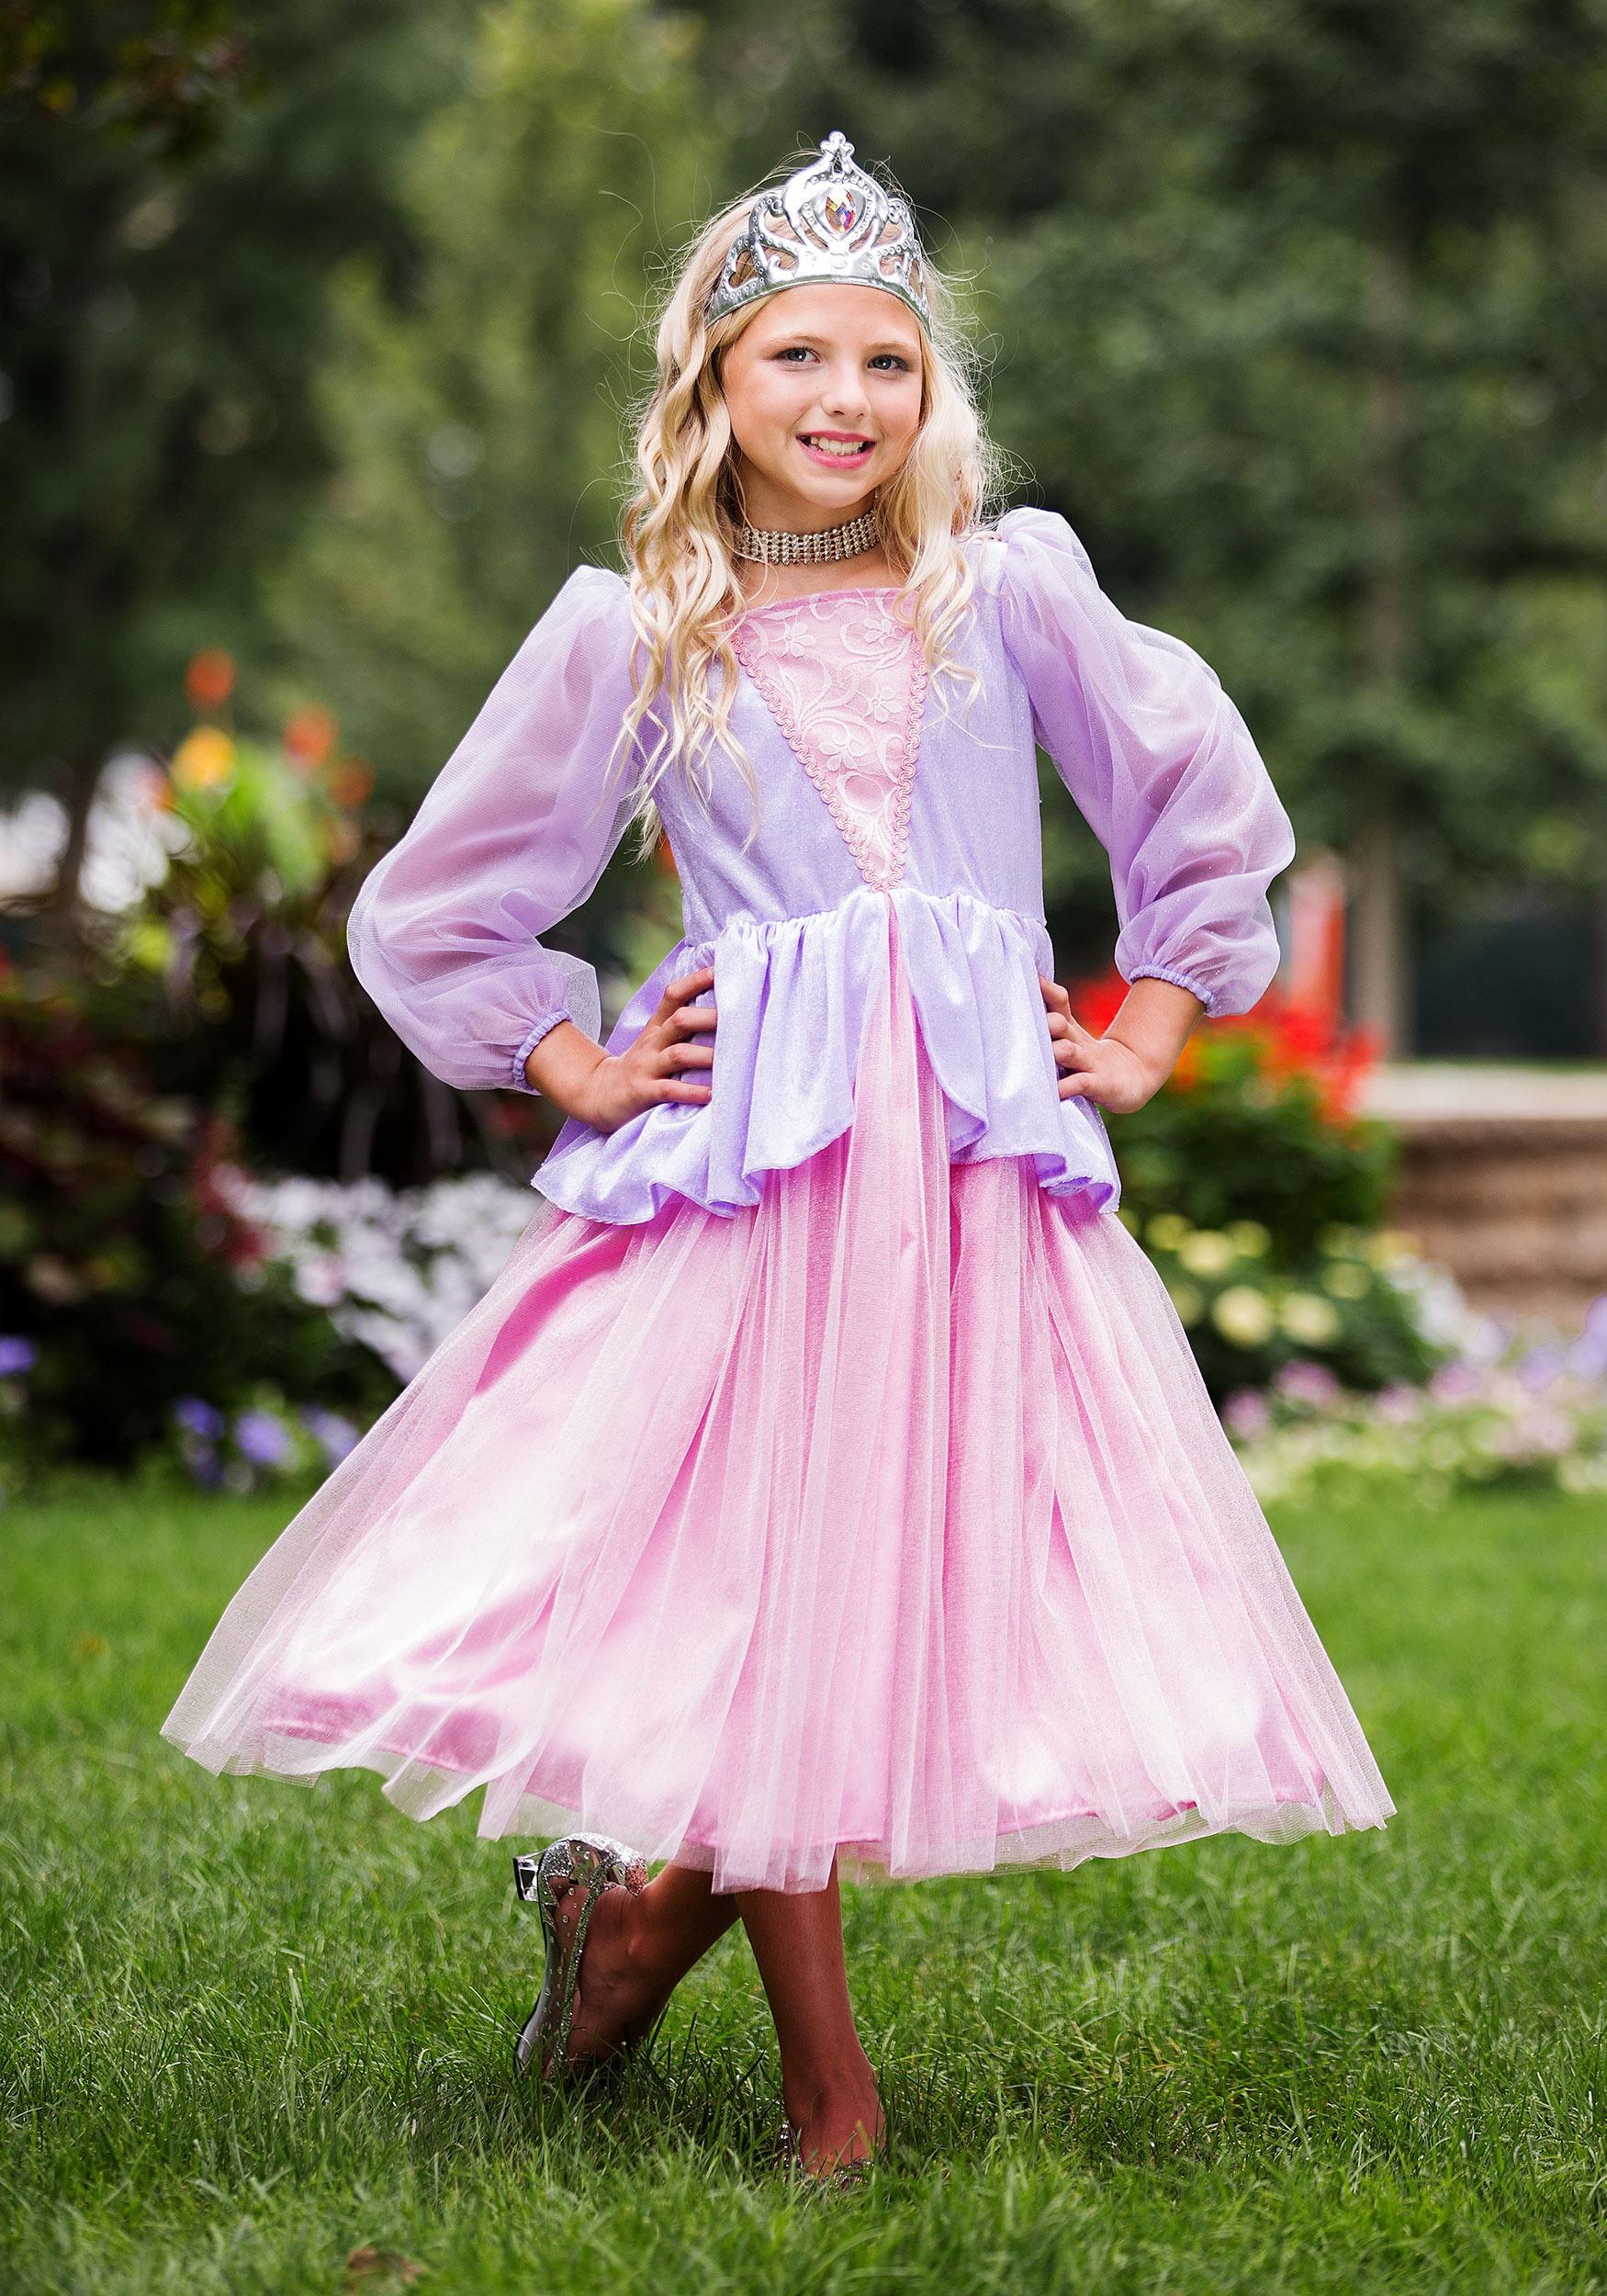 girlu0027s pink and lavender princess costume